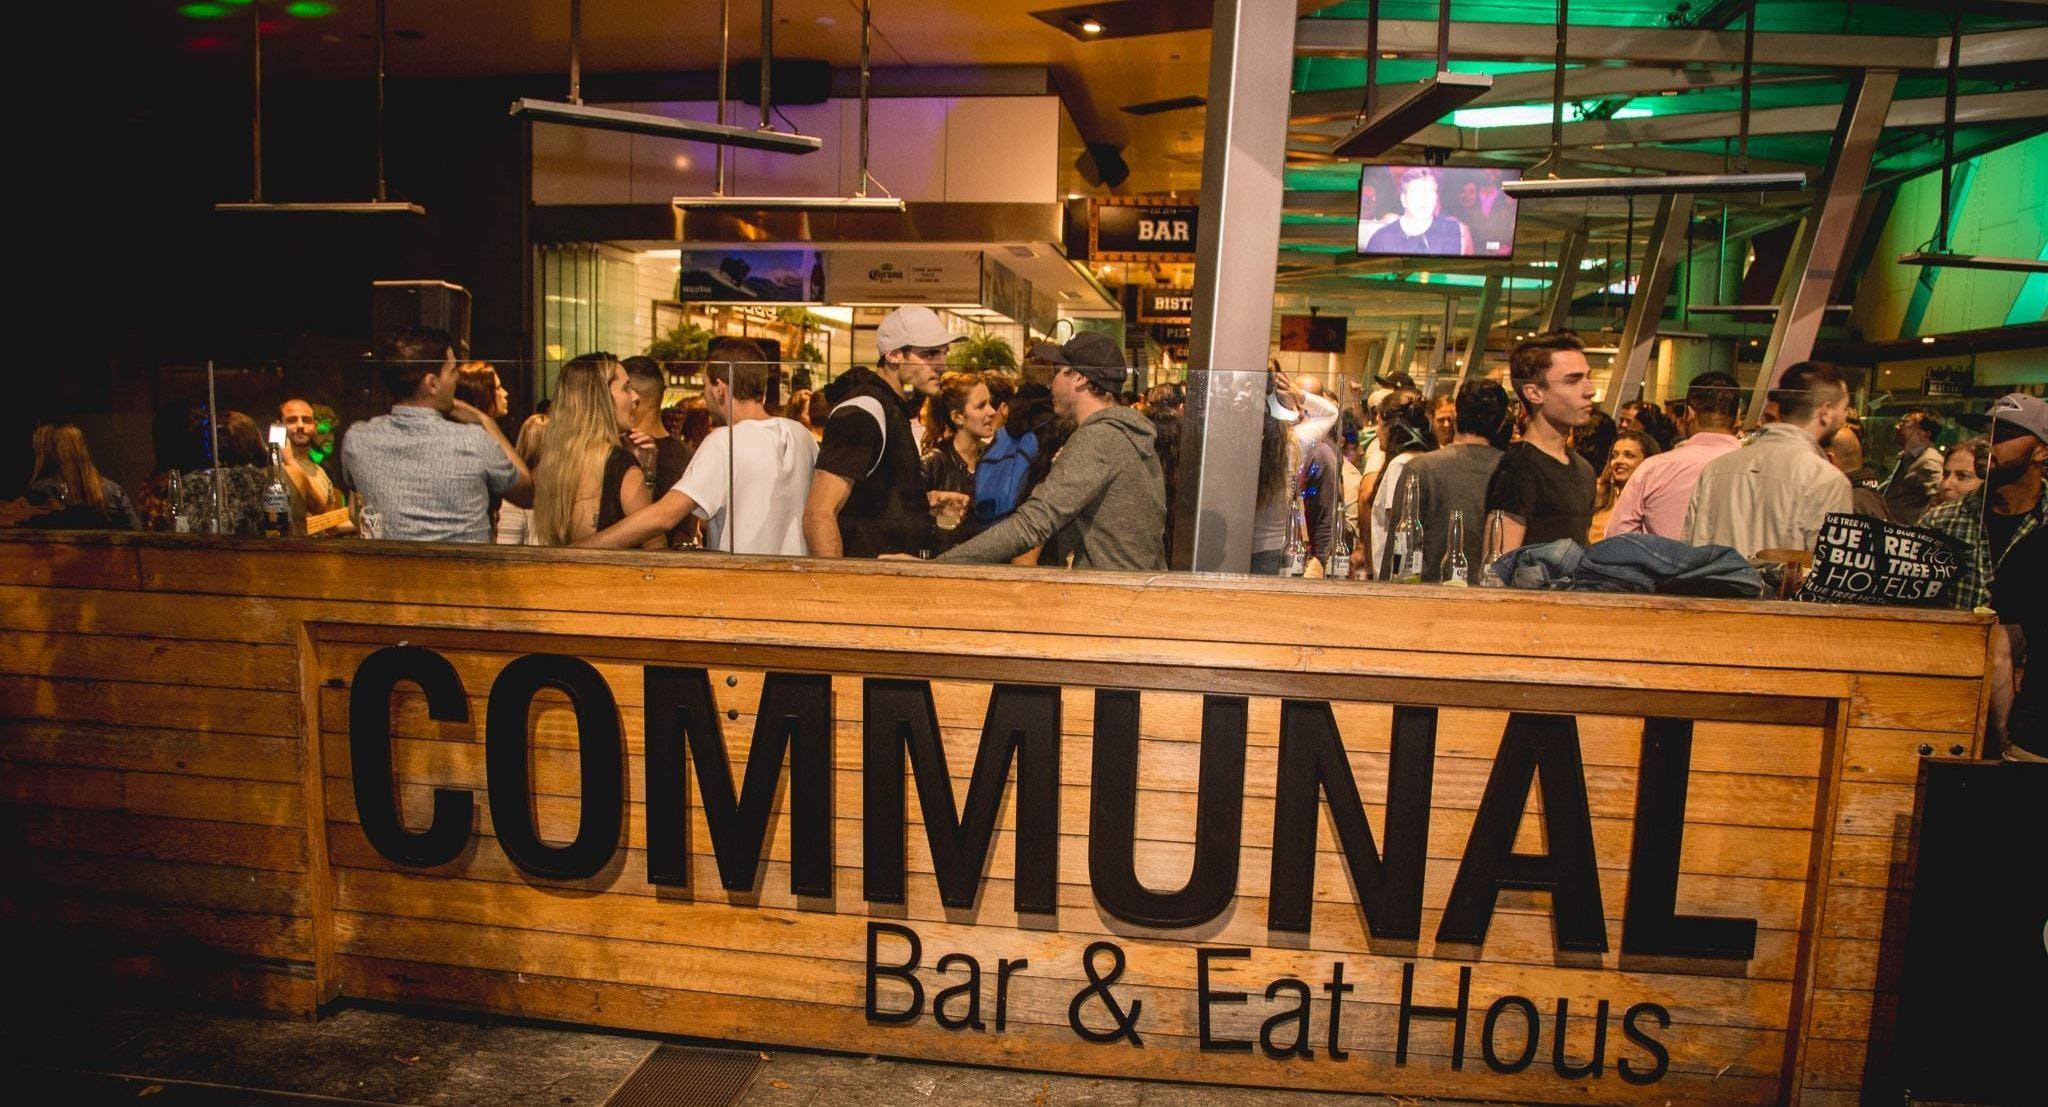 Communal Bar & Eat House